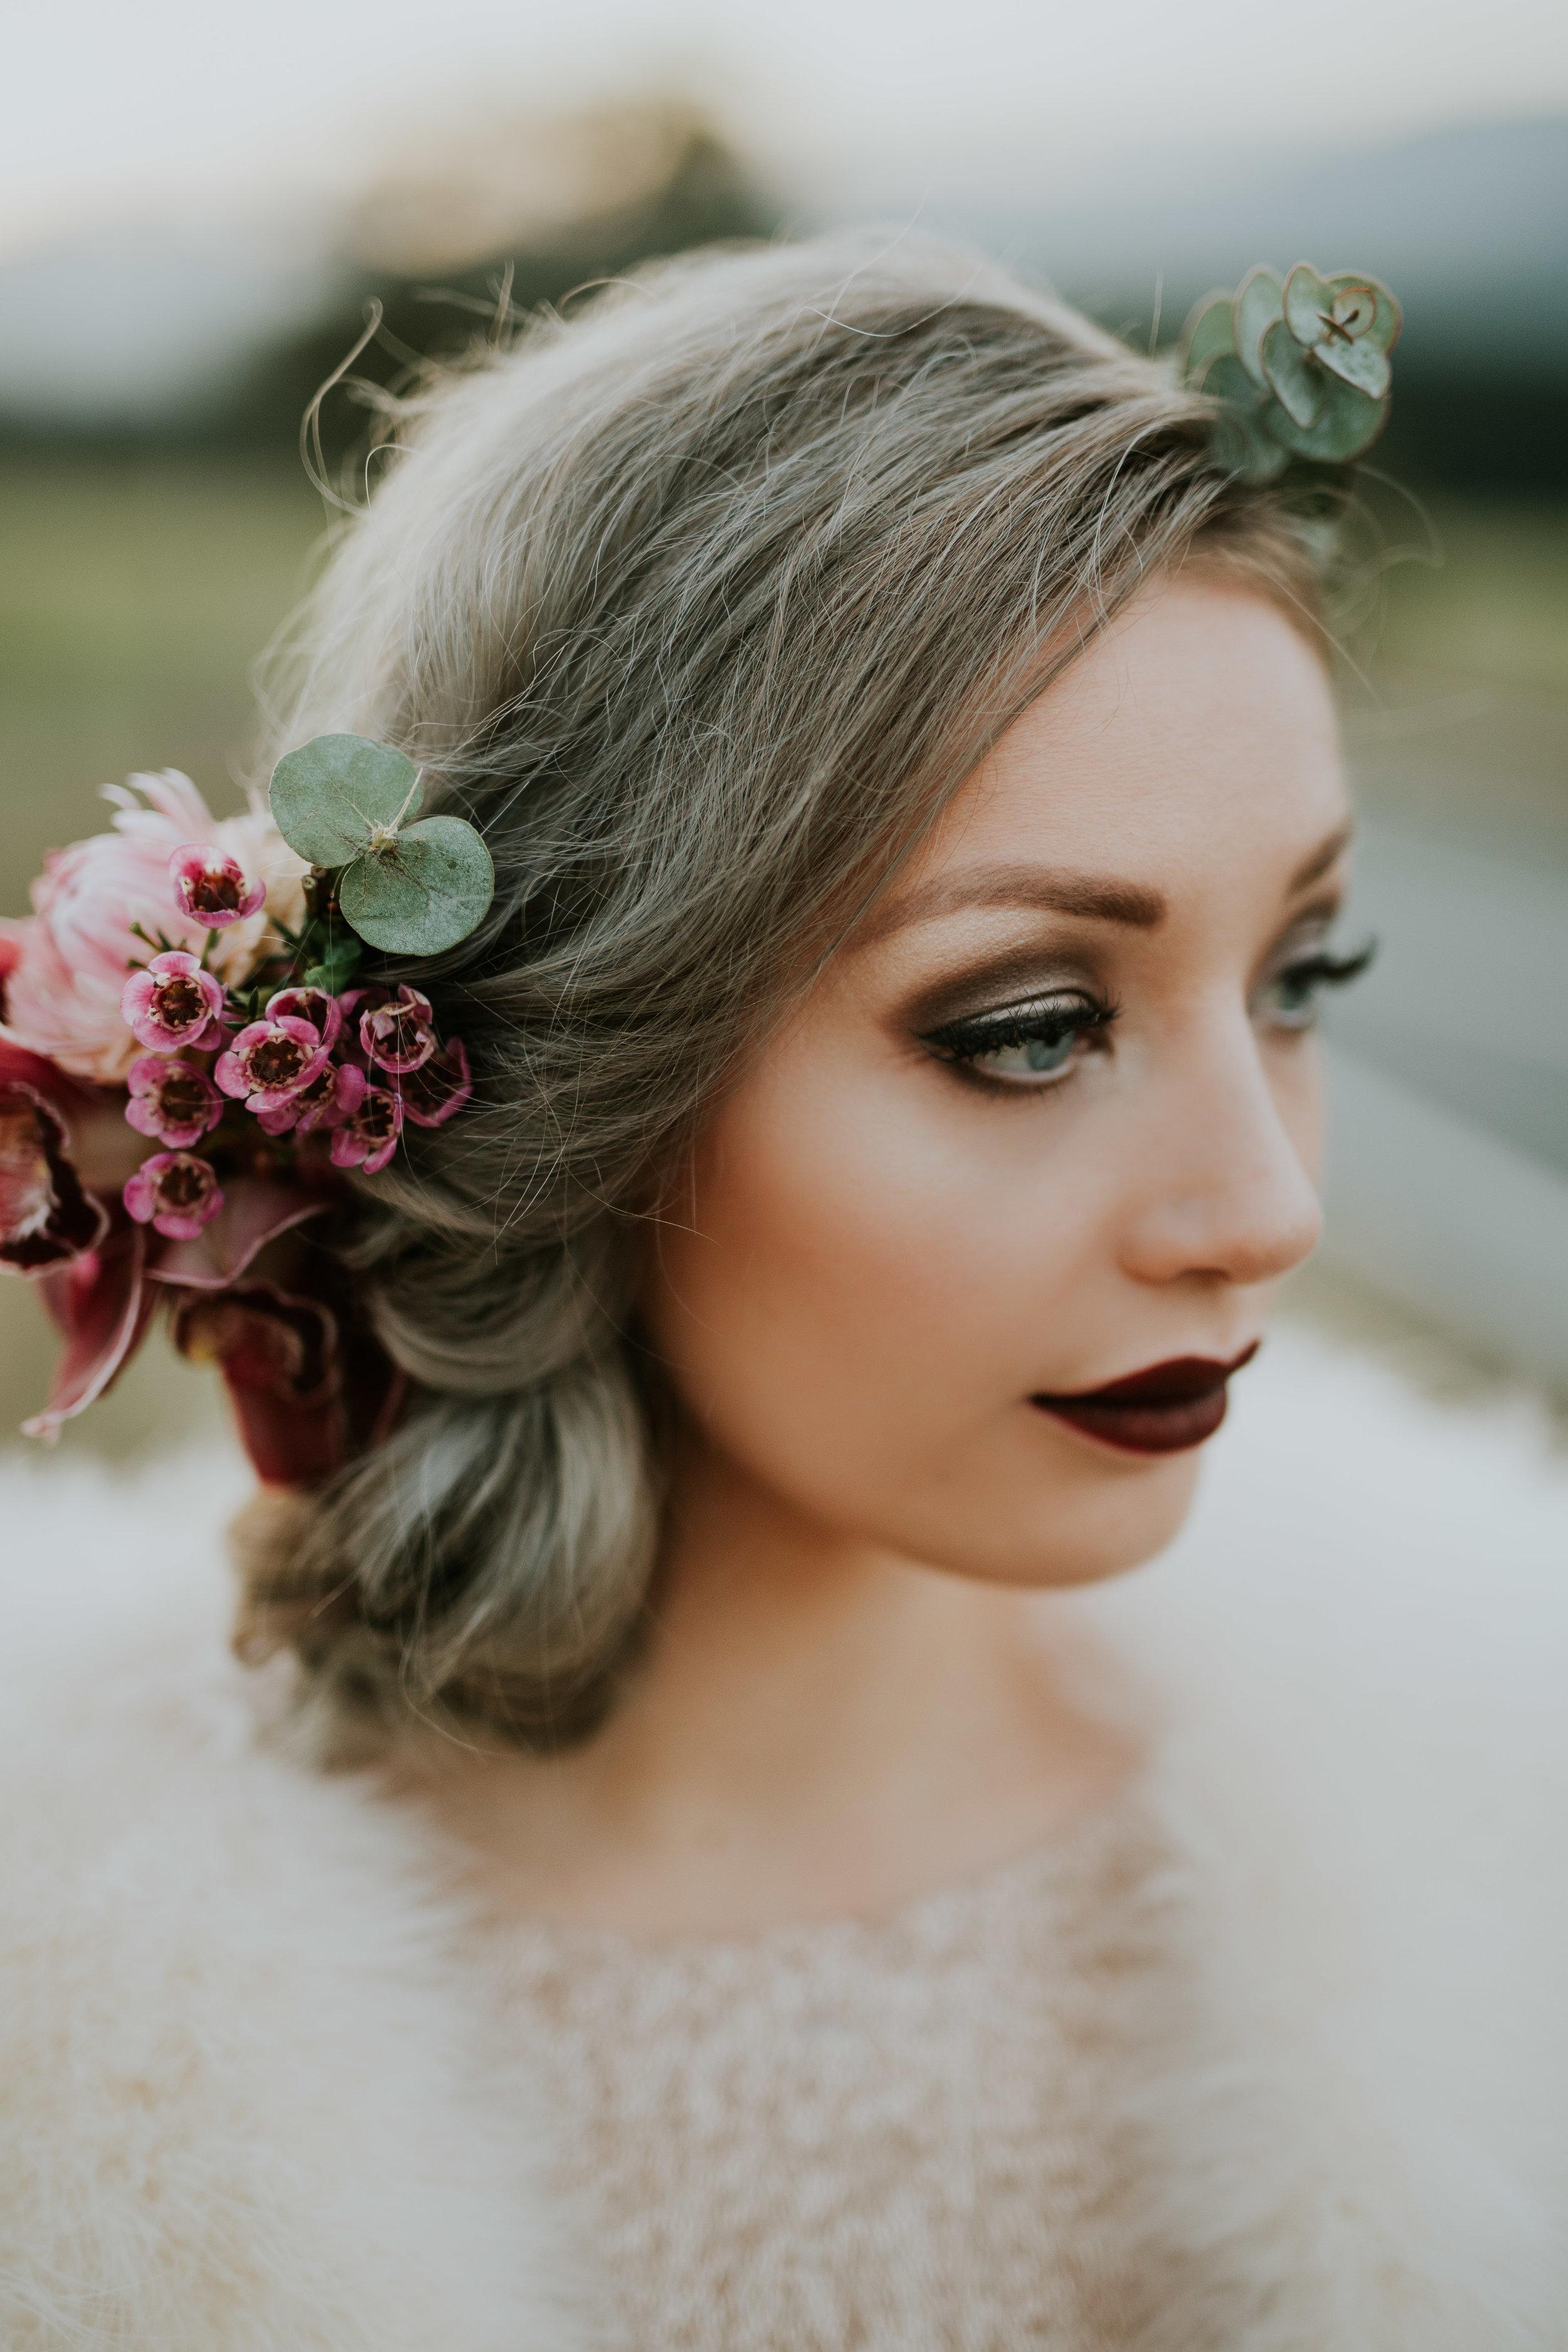 Winter wonderland wedding_alanataylorphoto-137.jpg